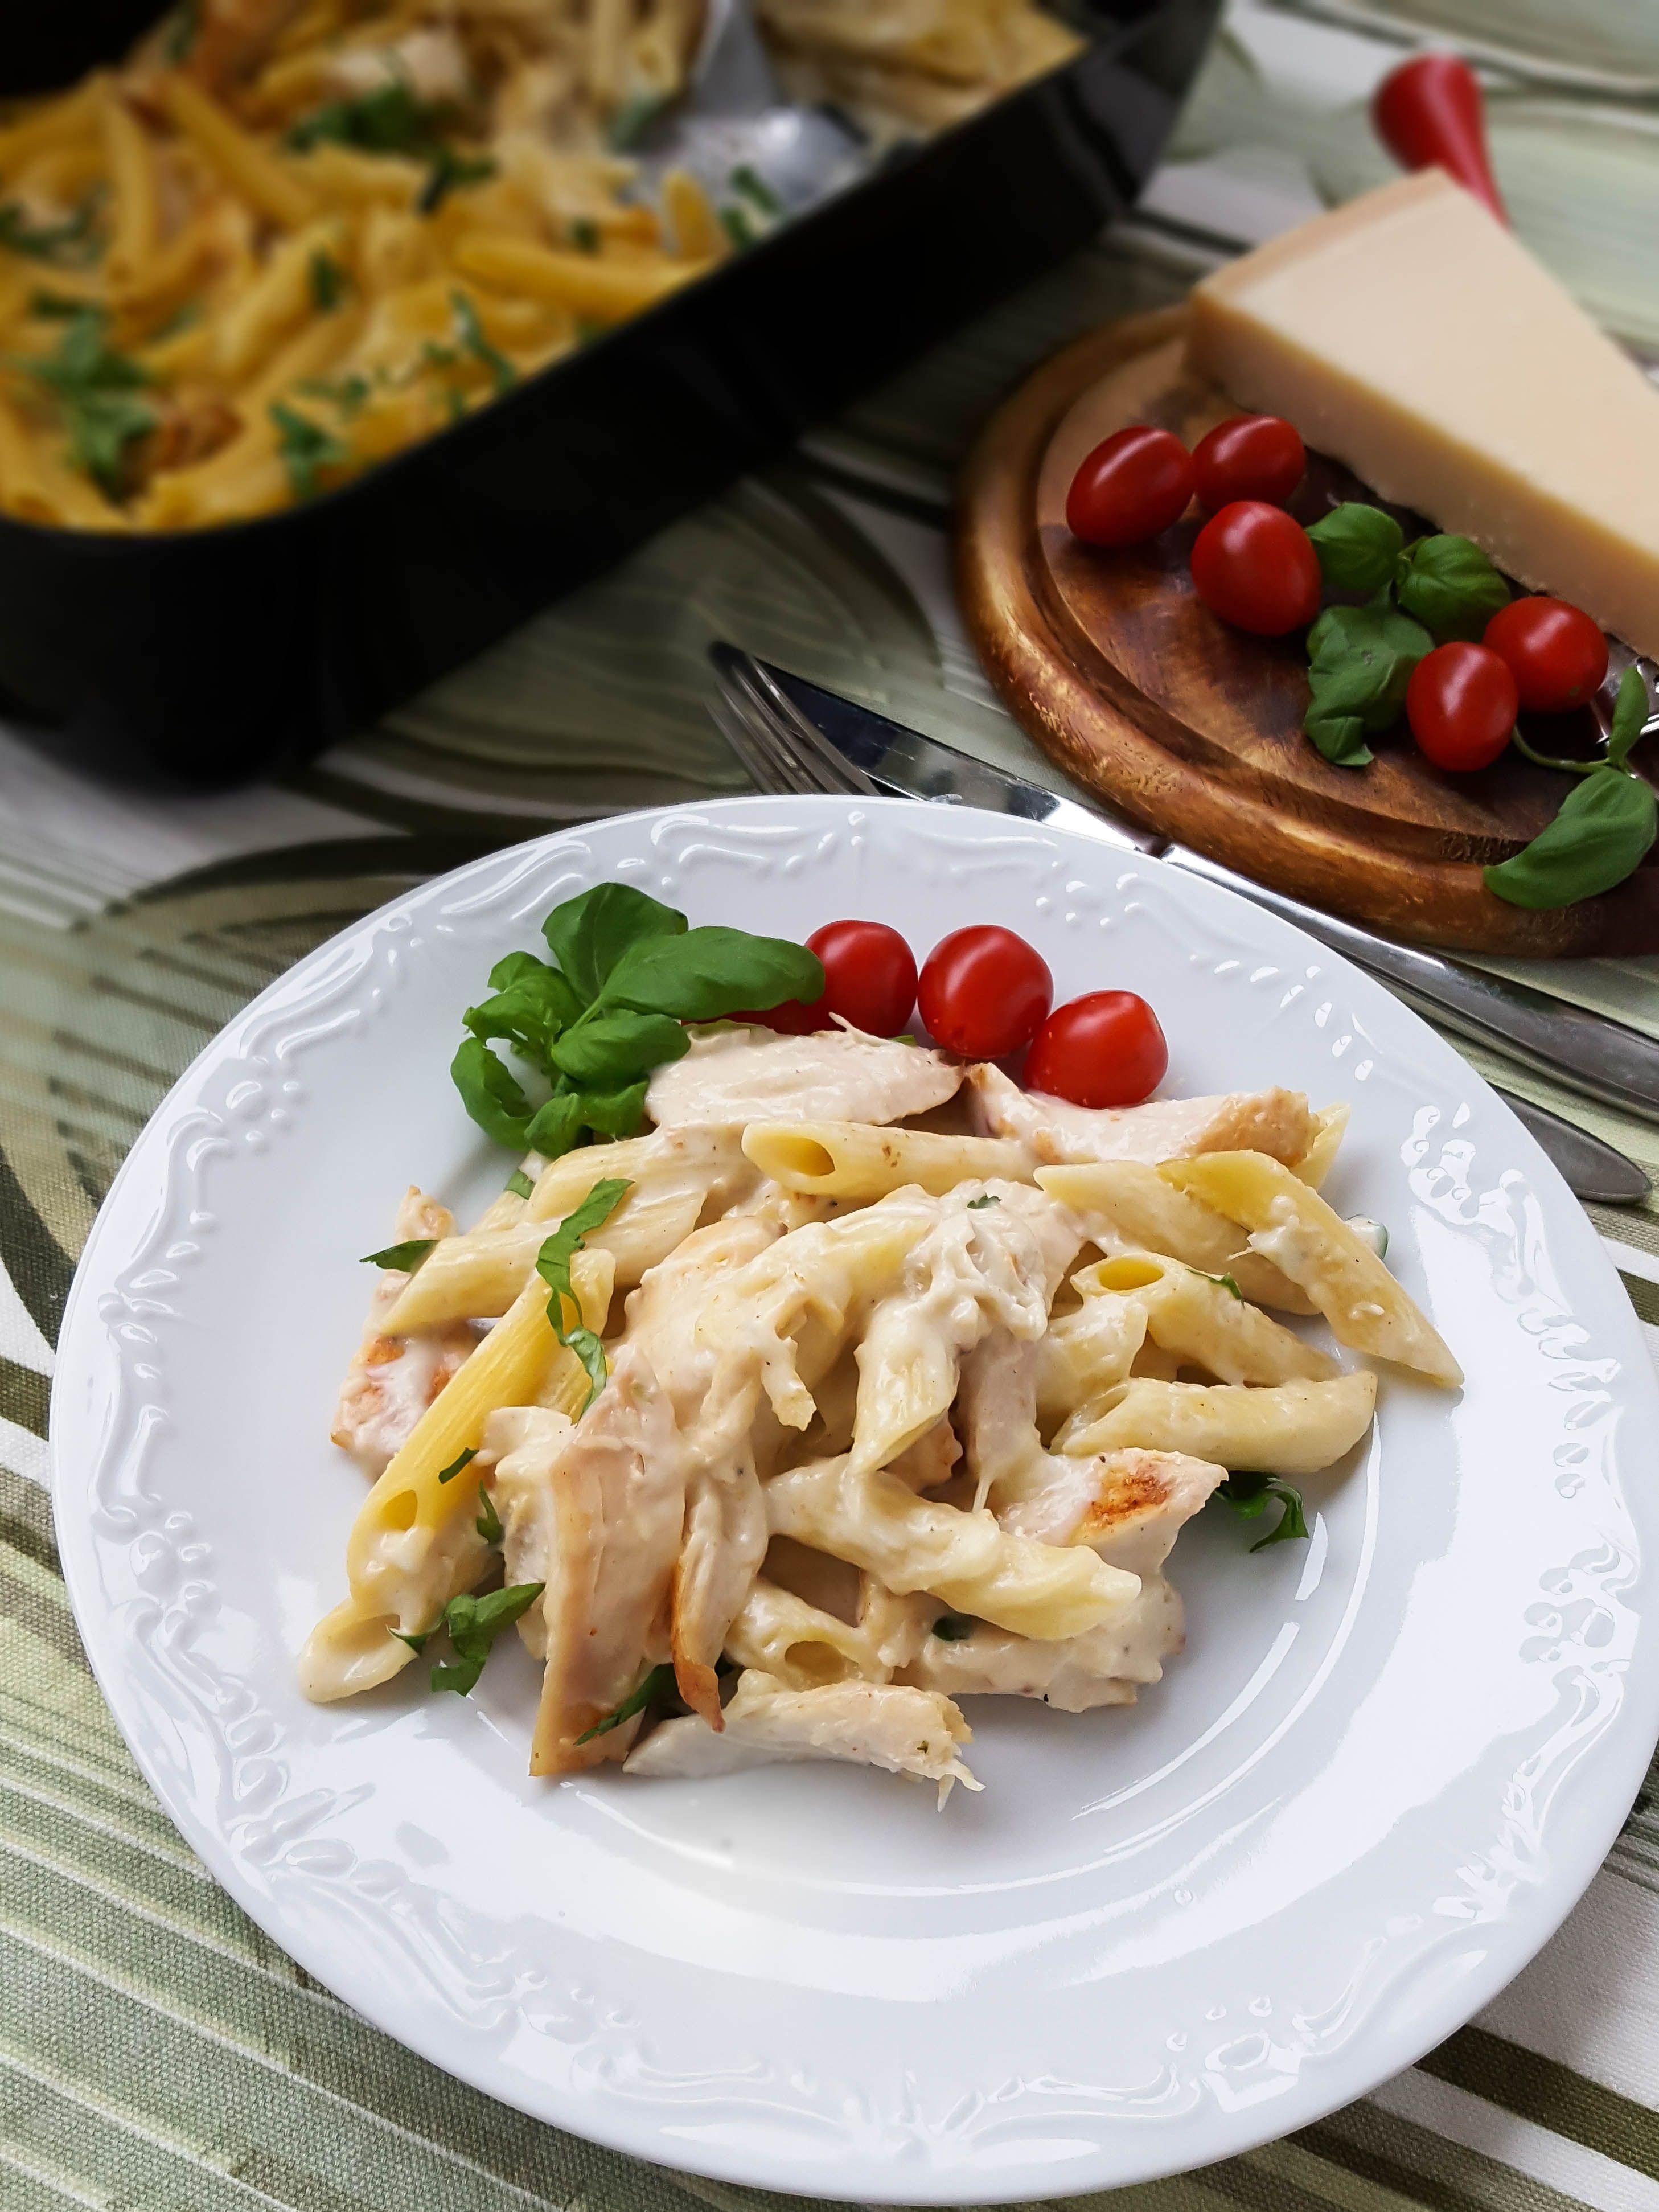 Ugnsbakad Pasta Alfredo Pastagratang Broccolisoppa Recept